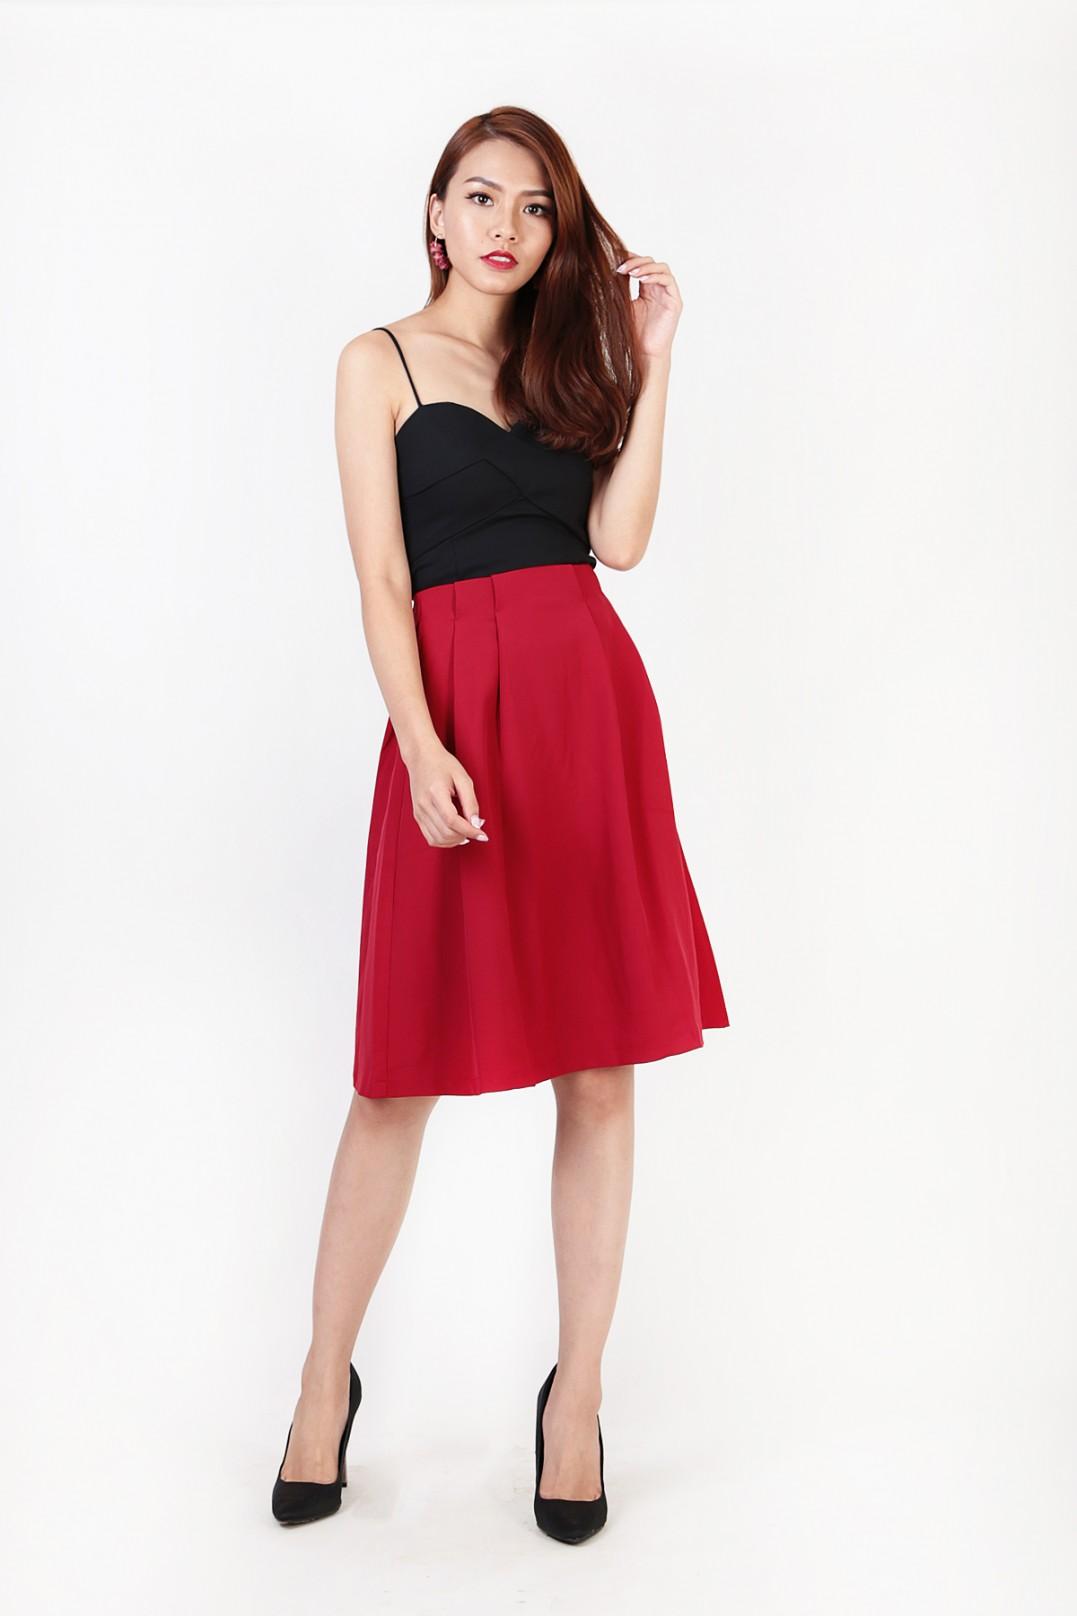 642cdbd14d0 Lisa Pleated Midi Skirt in Wine Red - MGP